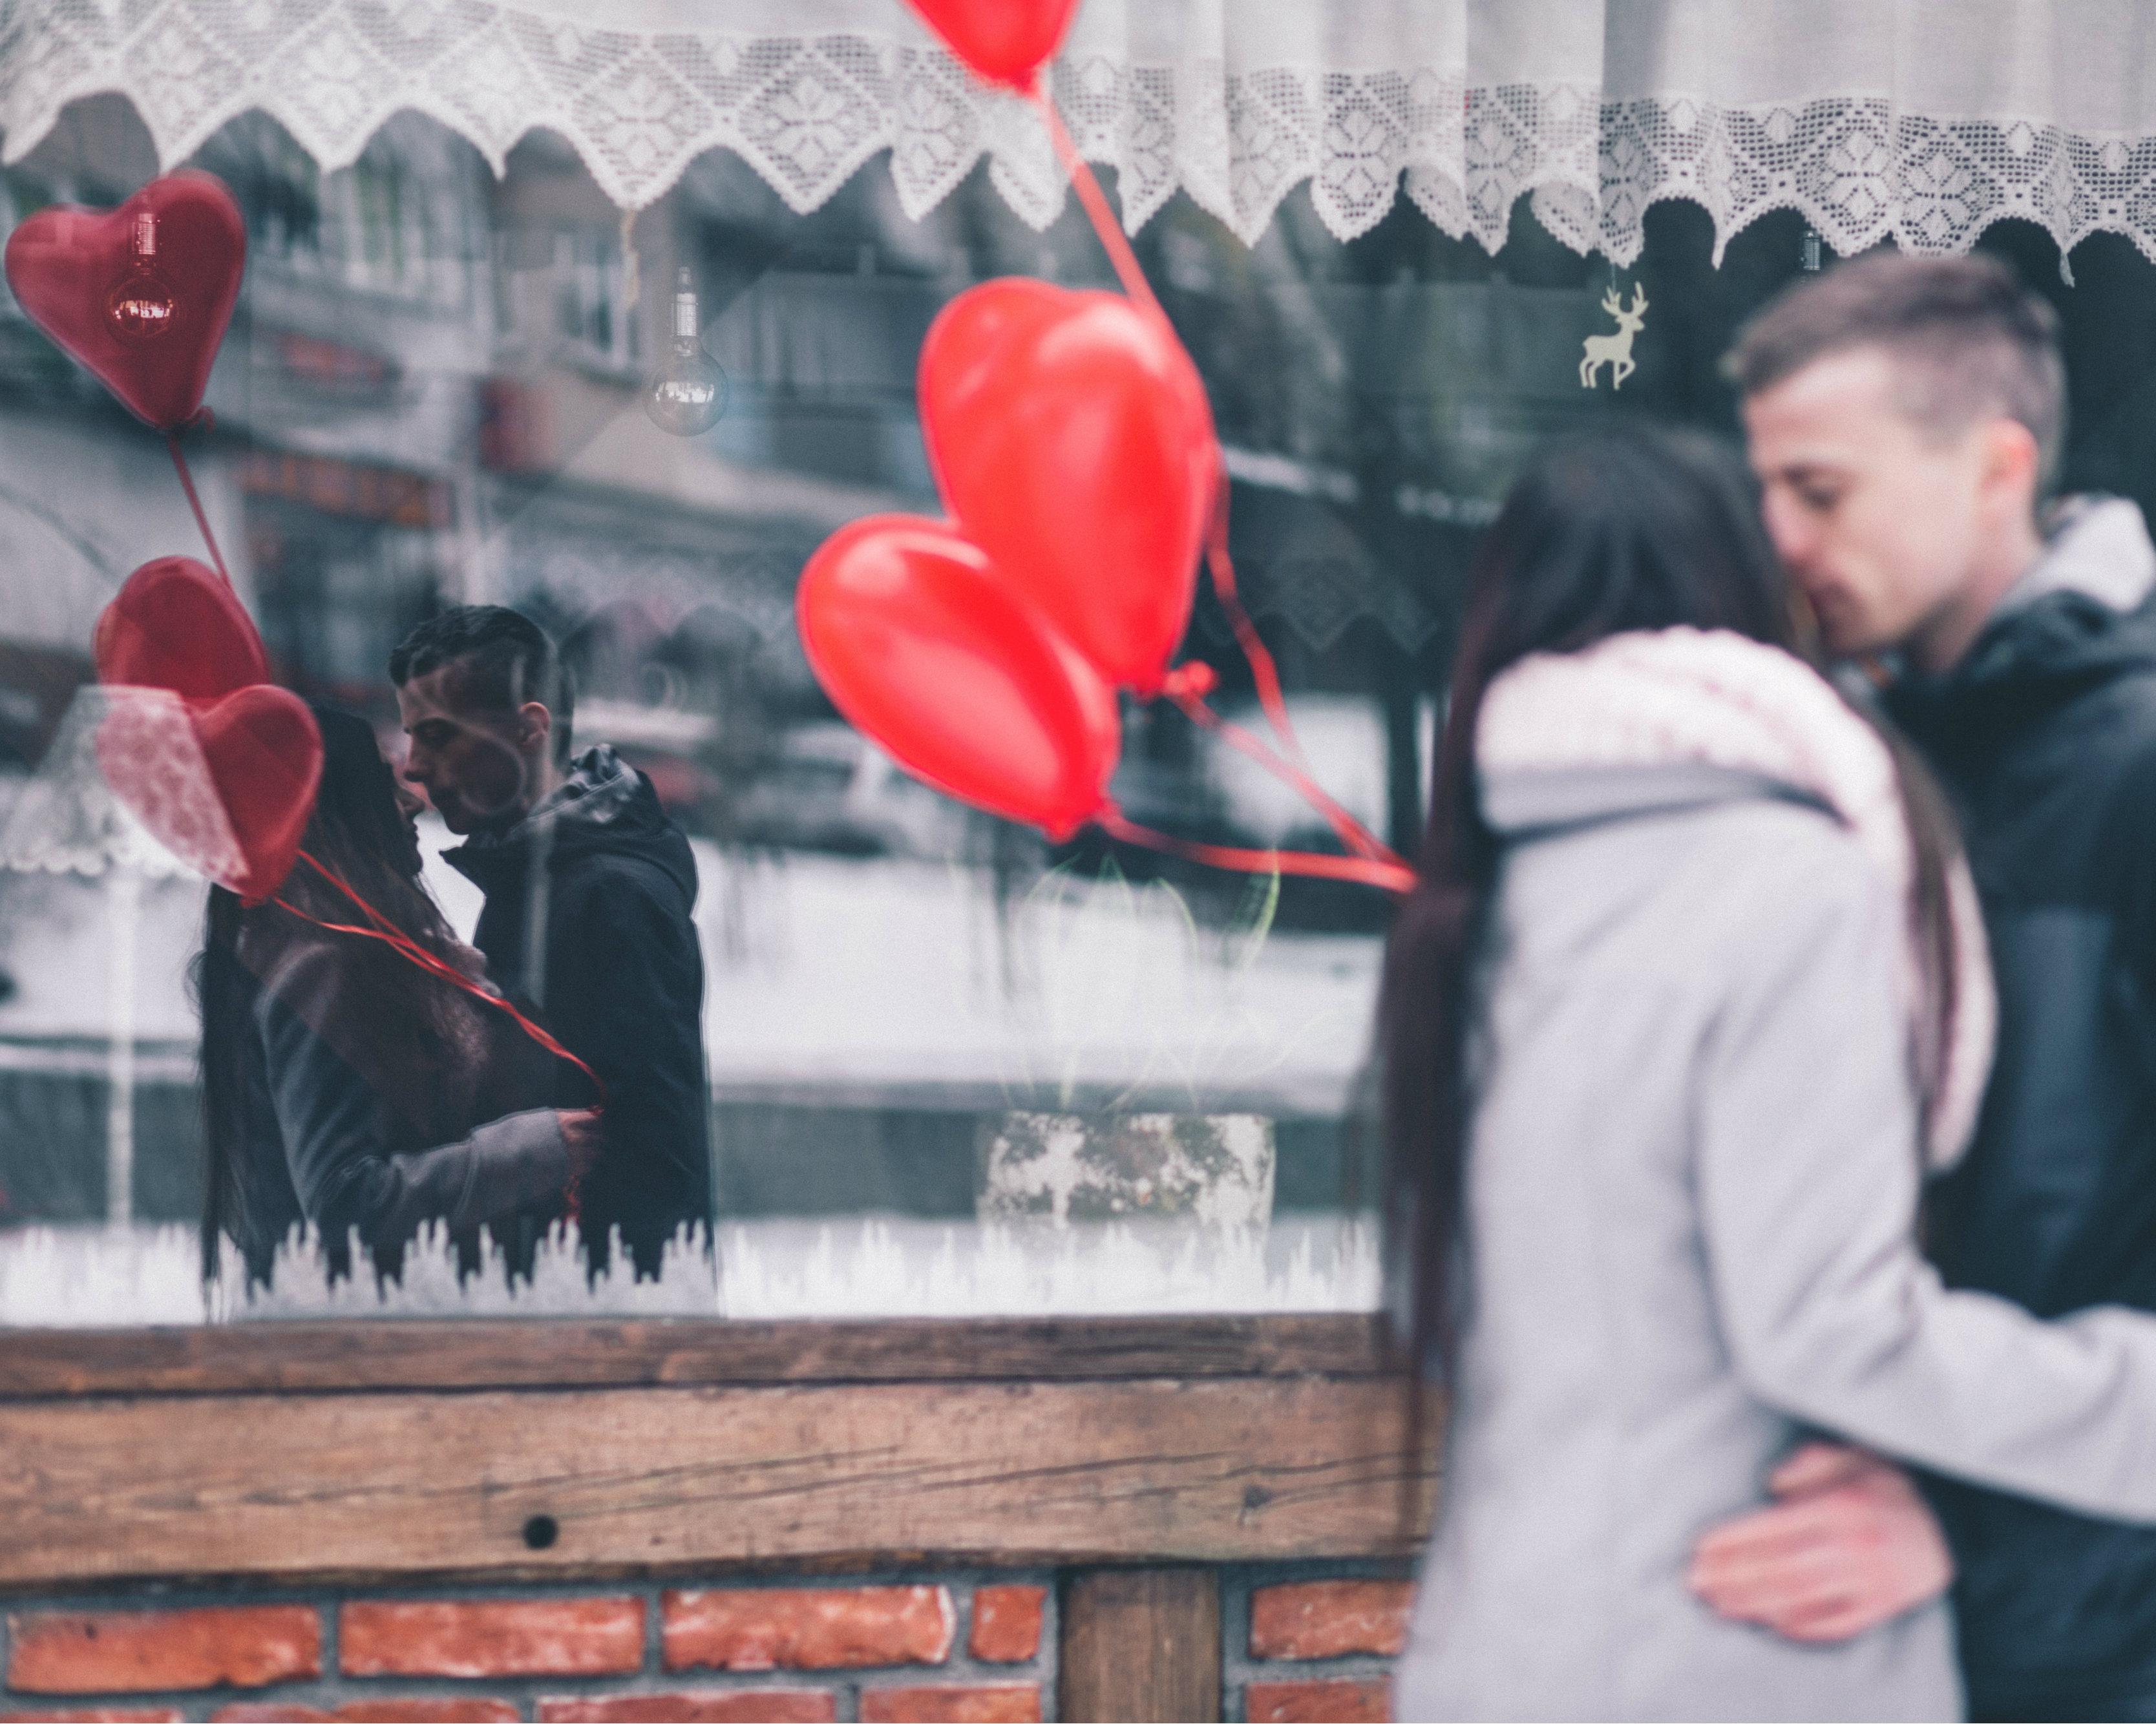 beste dating profiel zelf samenvatting Business speed dating Fragen